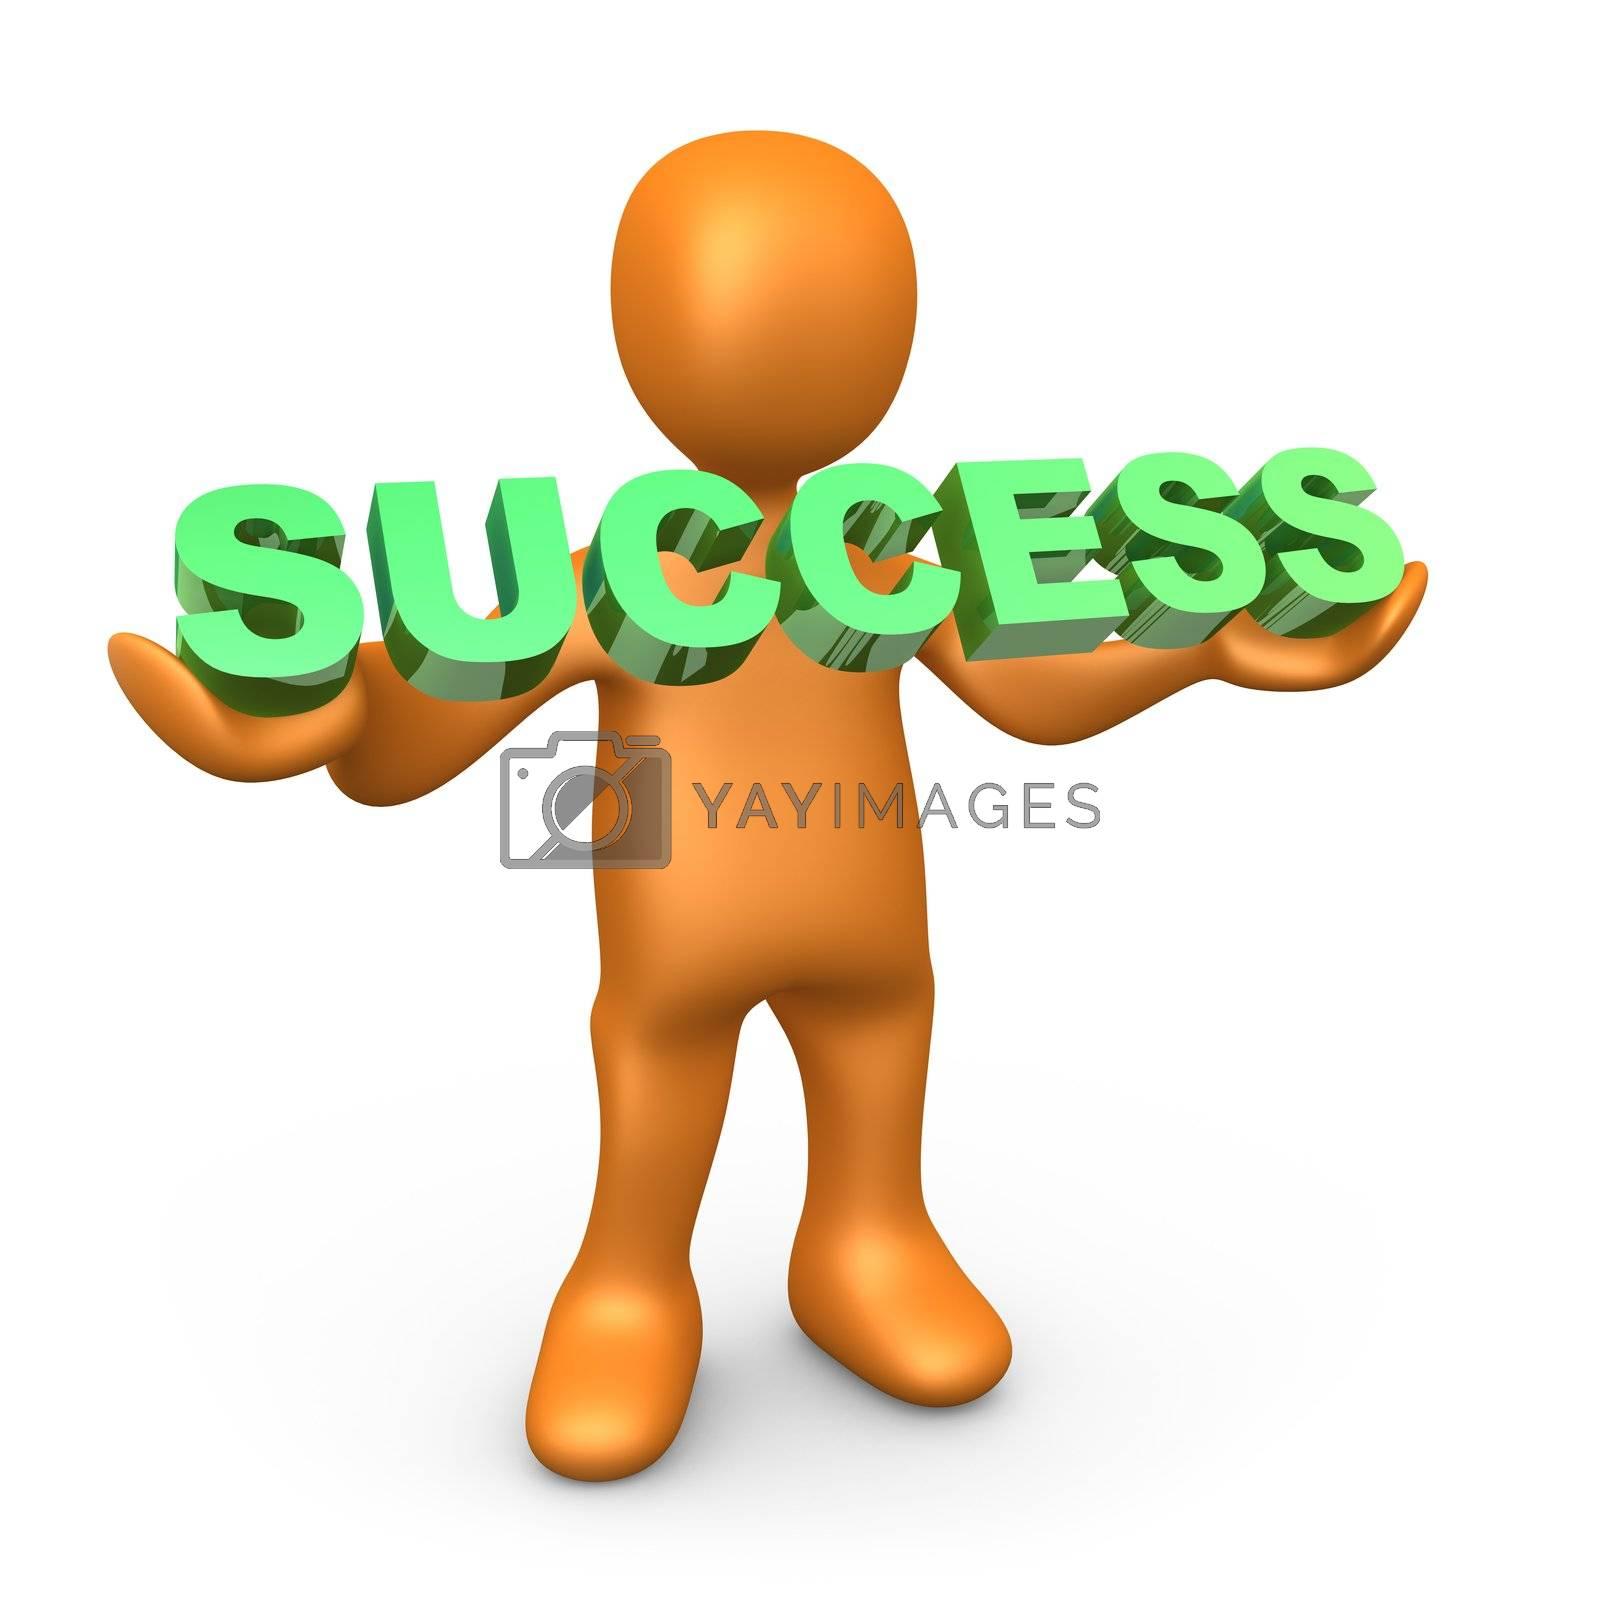 Success by 3pod